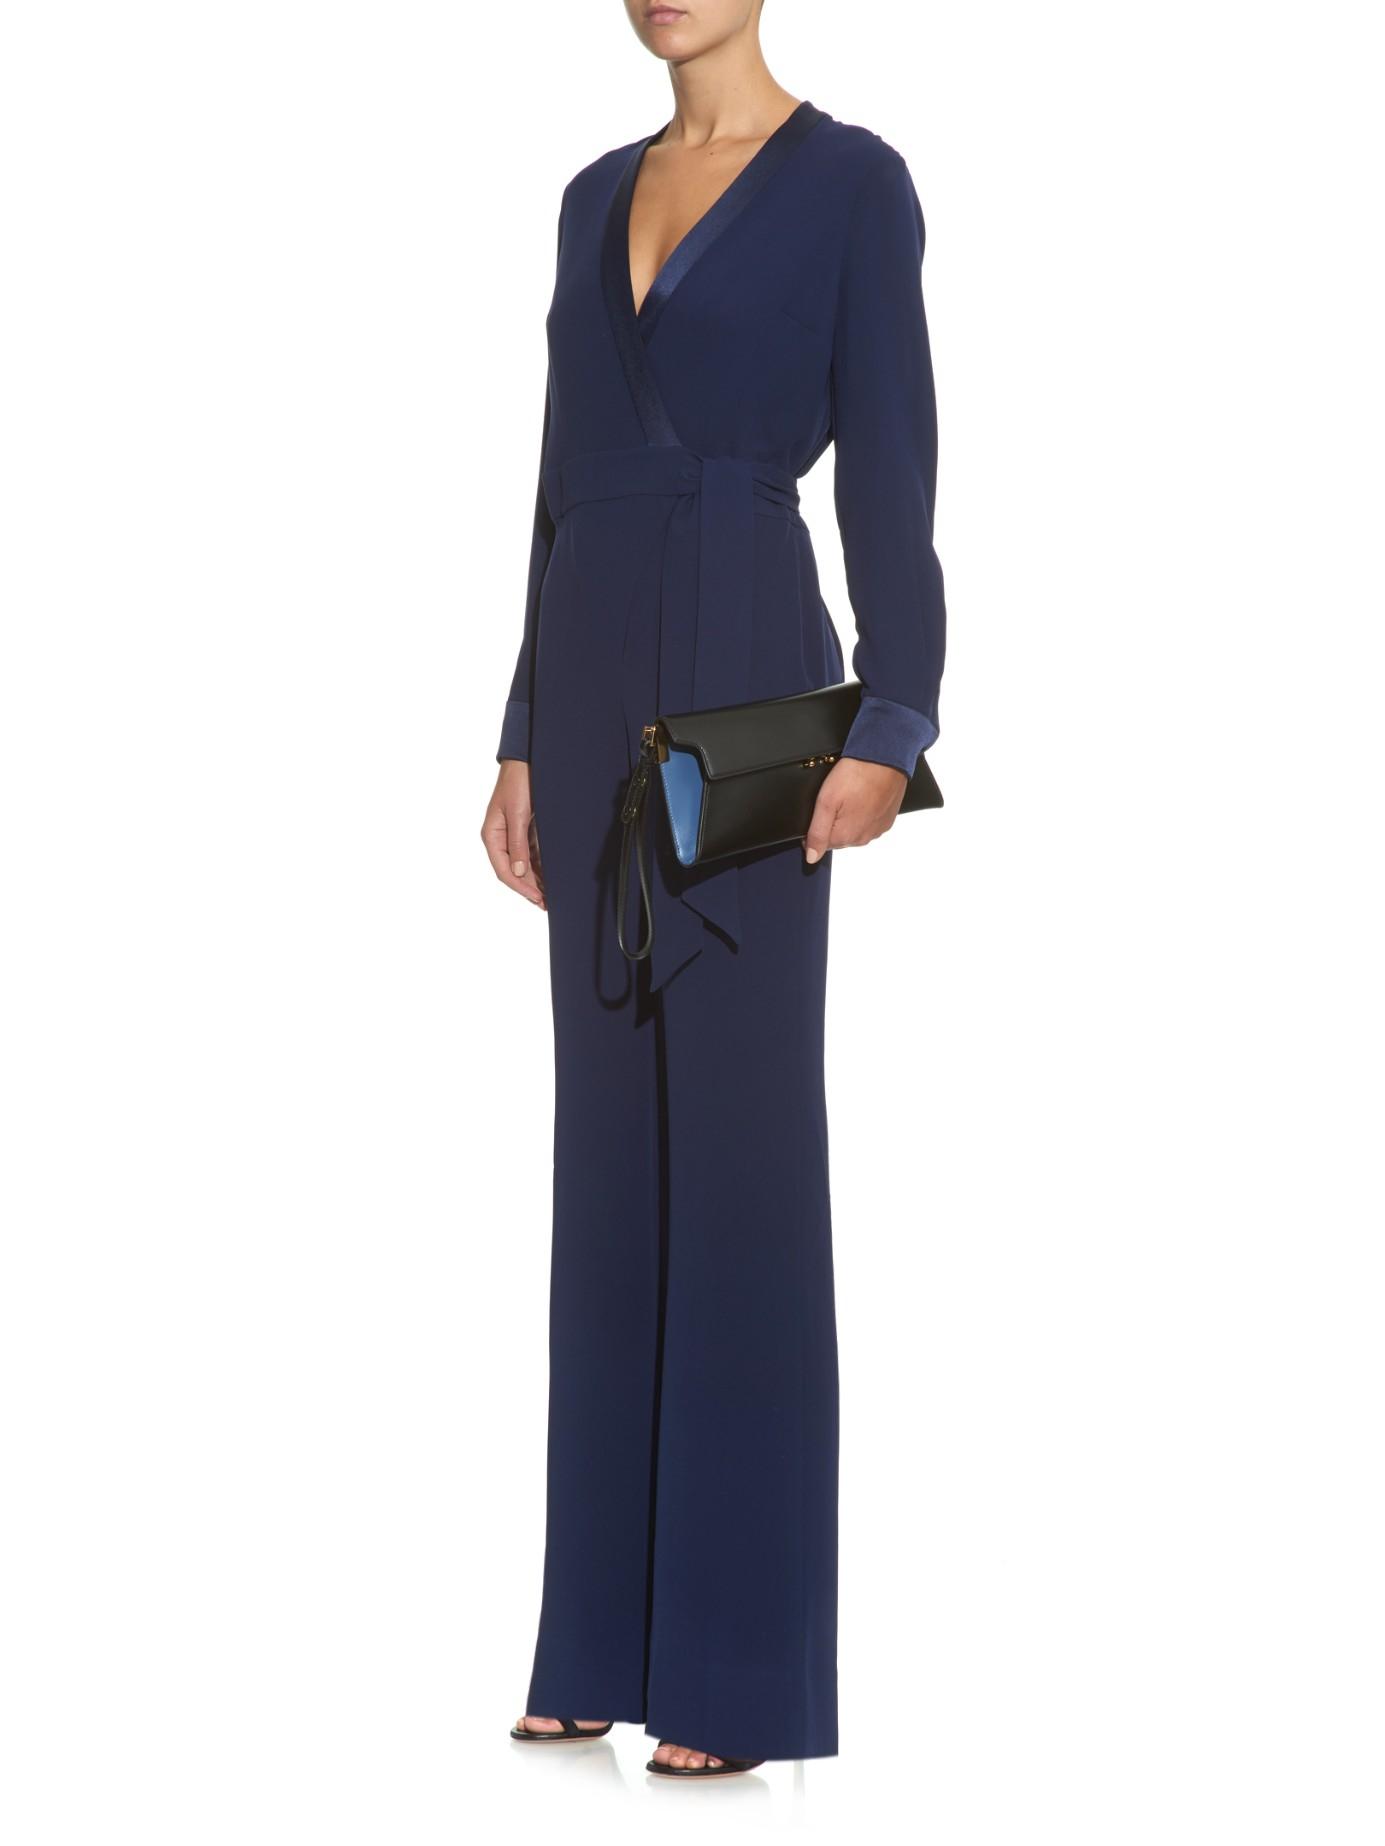 73964f467a5 Gallery. Previously sold at  MATCHESFASHION.COM · Women s Diane Von  Furstenberg Arabella Women s Olive Jumpsuits ...